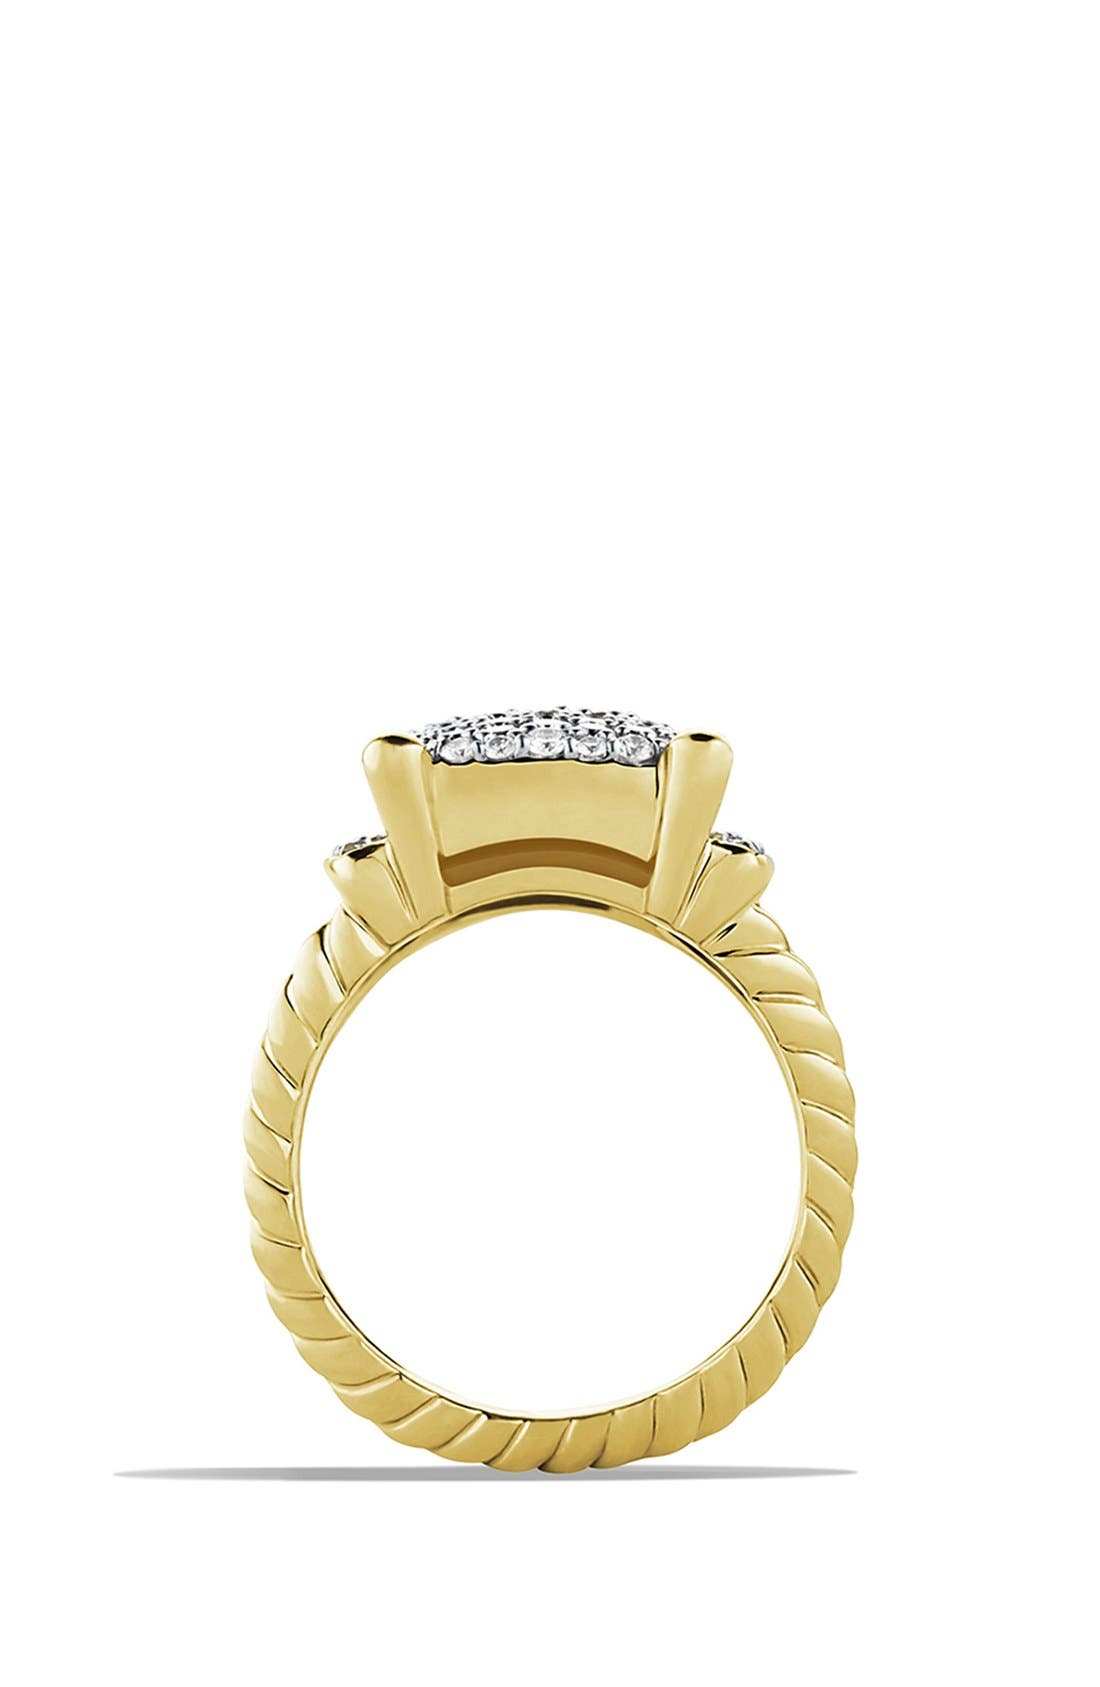 'Wheaton' Ring with Diamonds in Gold,                             Alternate thumbnail 5, color,                             DIAMOND